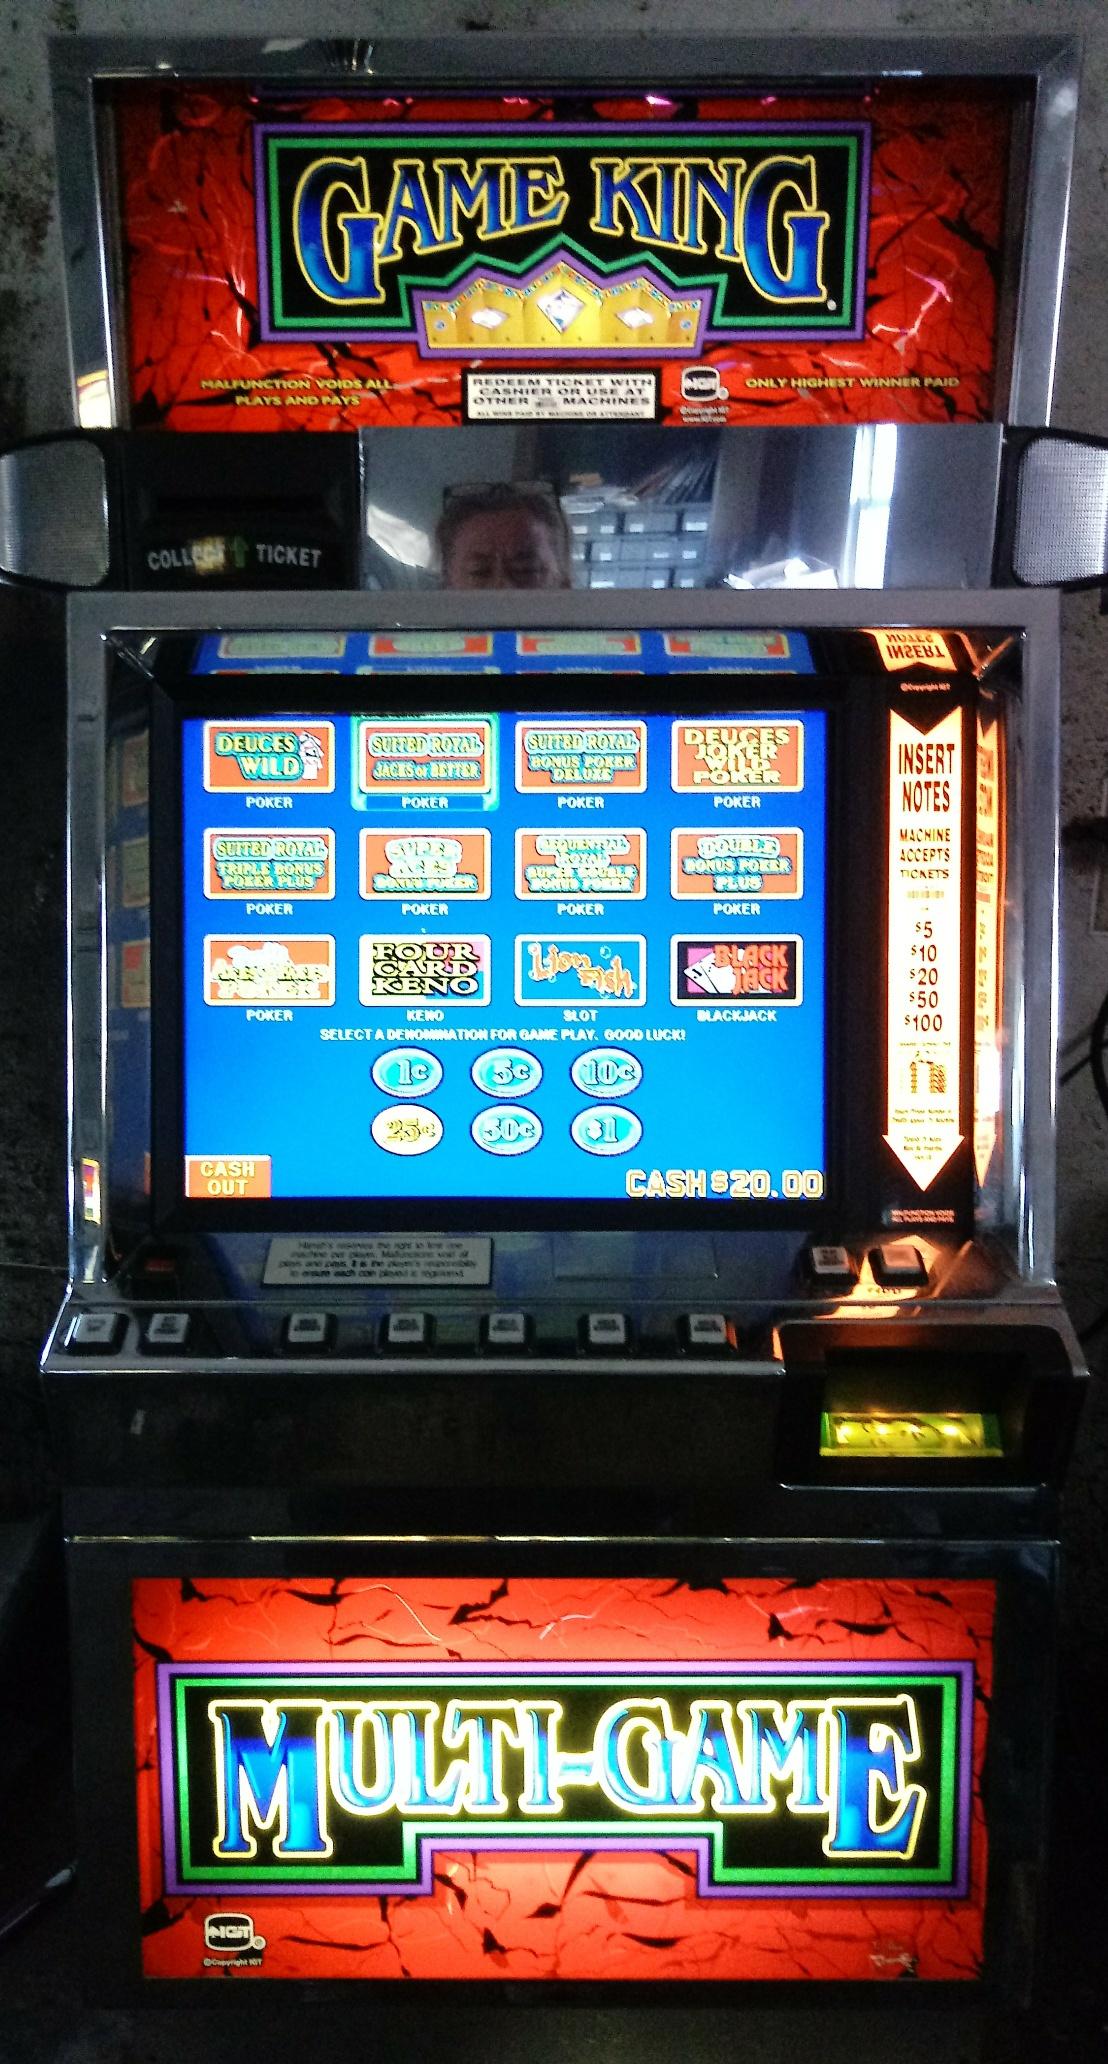 New Igt Slot Machines